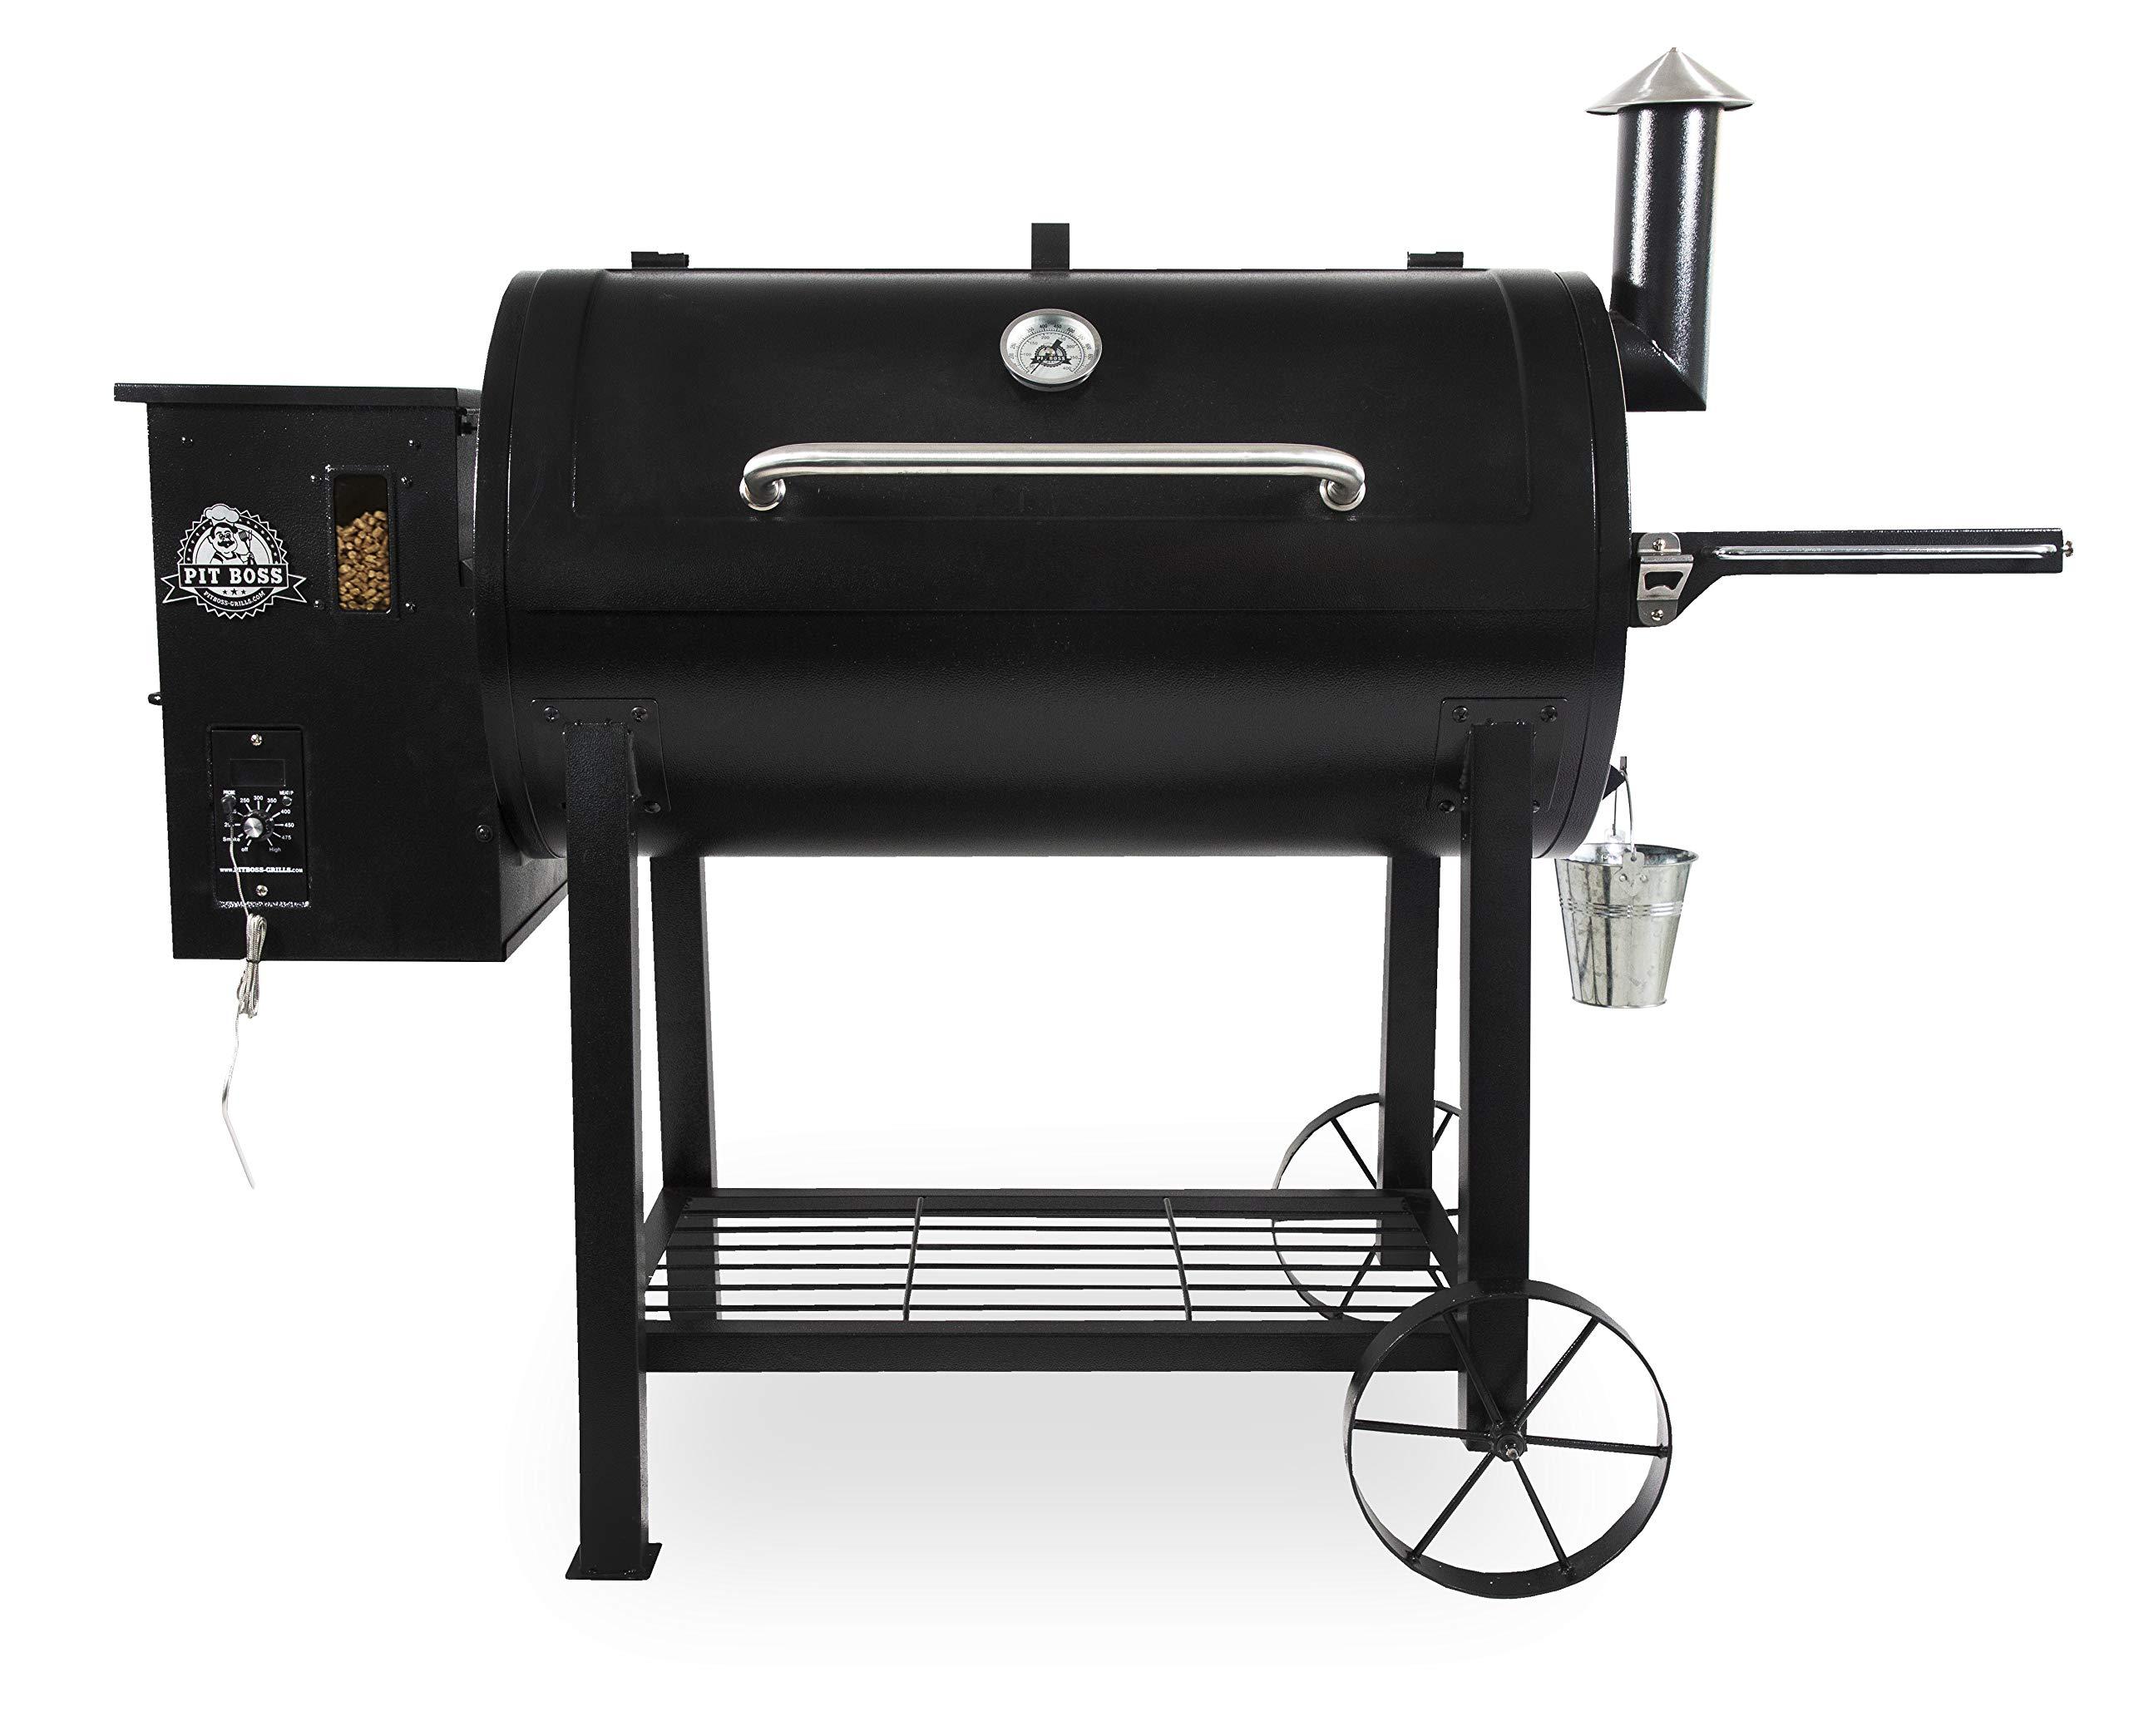 Pit Boss Grills Pit Boss PB1000T1 BBQ, Pellet, Outdoor Grill, Smoker, electr, Black